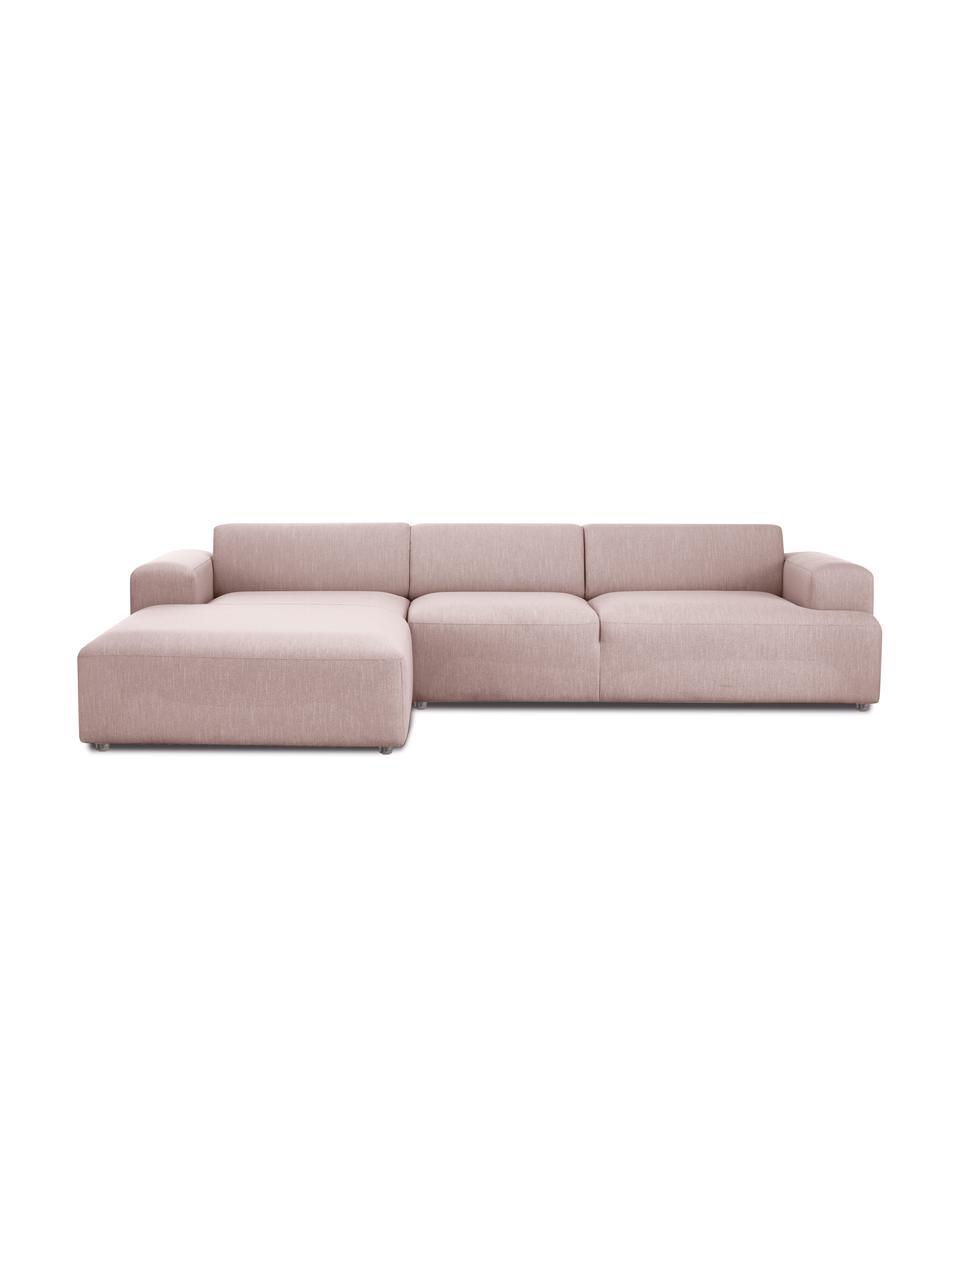 Ecksofa Melva (4-Sitzer) in Rosa, Bezug: 100% Polyester Der hochwe, Gestell: Massives Kiefernholz, FSC, Füße: Kunststoff, Webstoff Rosa, B 319 x T 196 cm